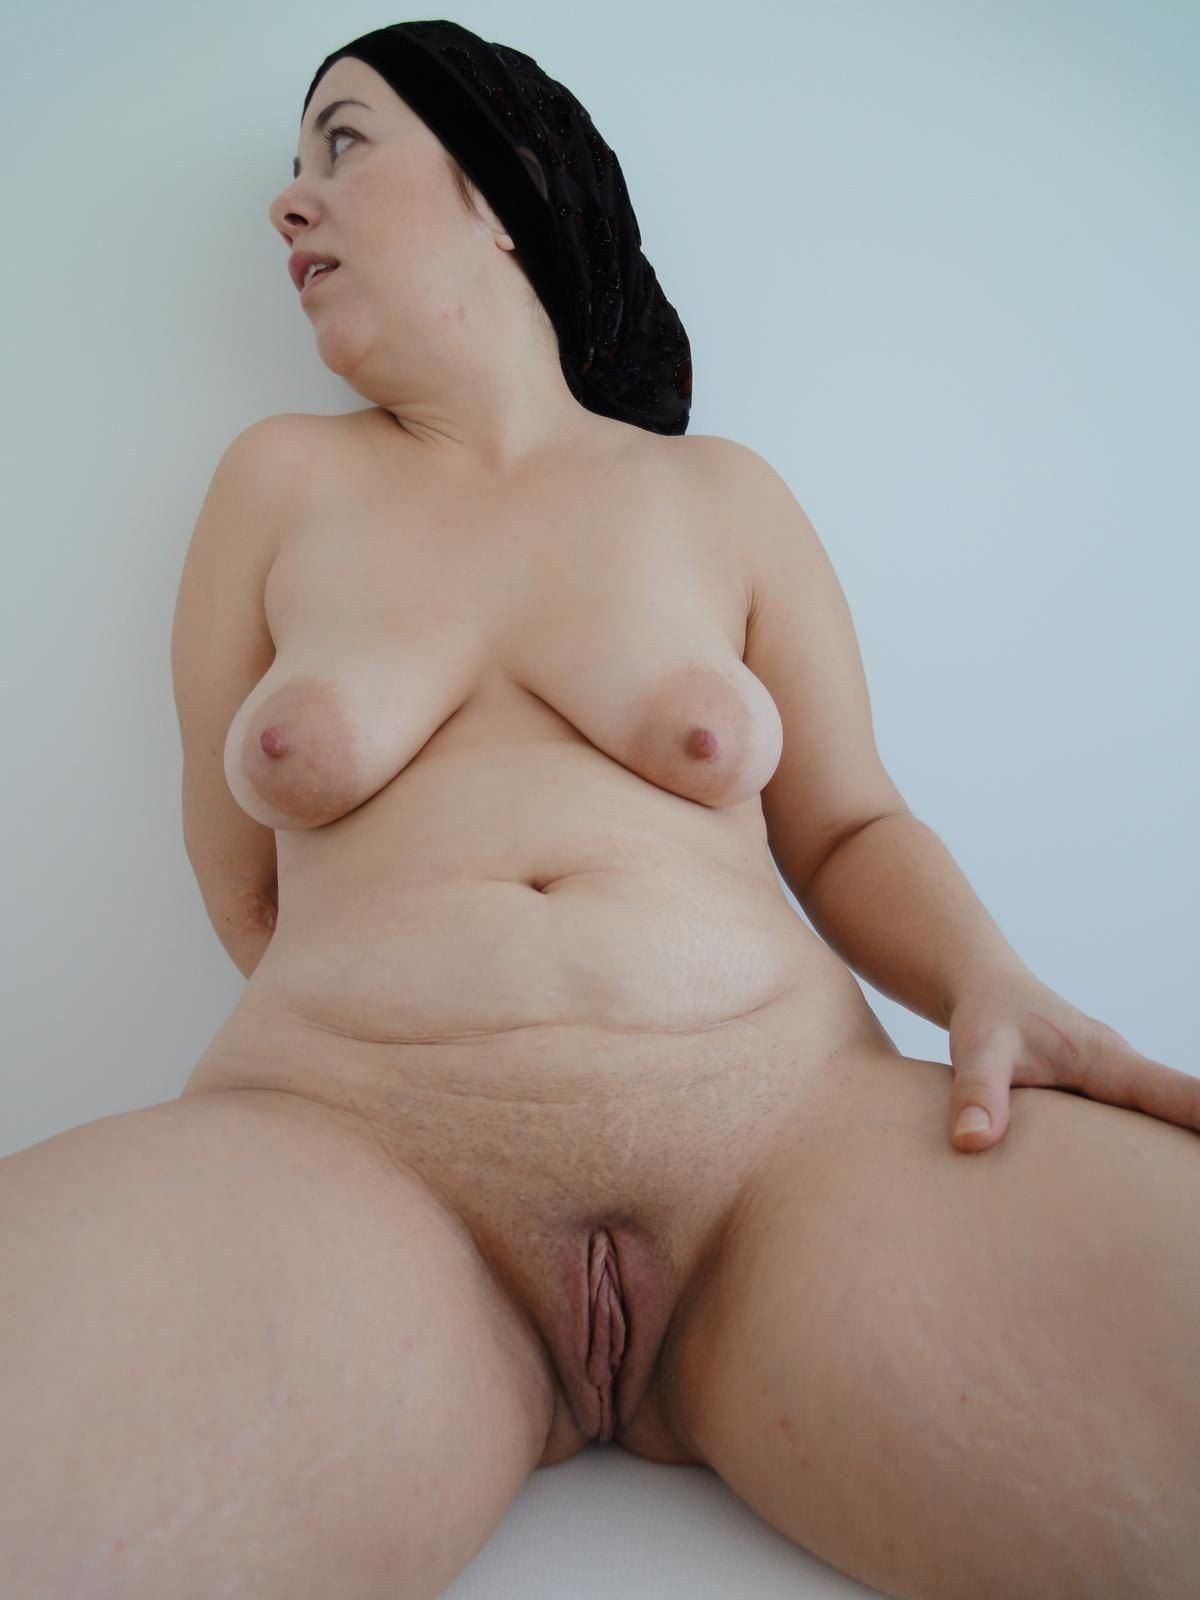 Homemade bbw porn tube